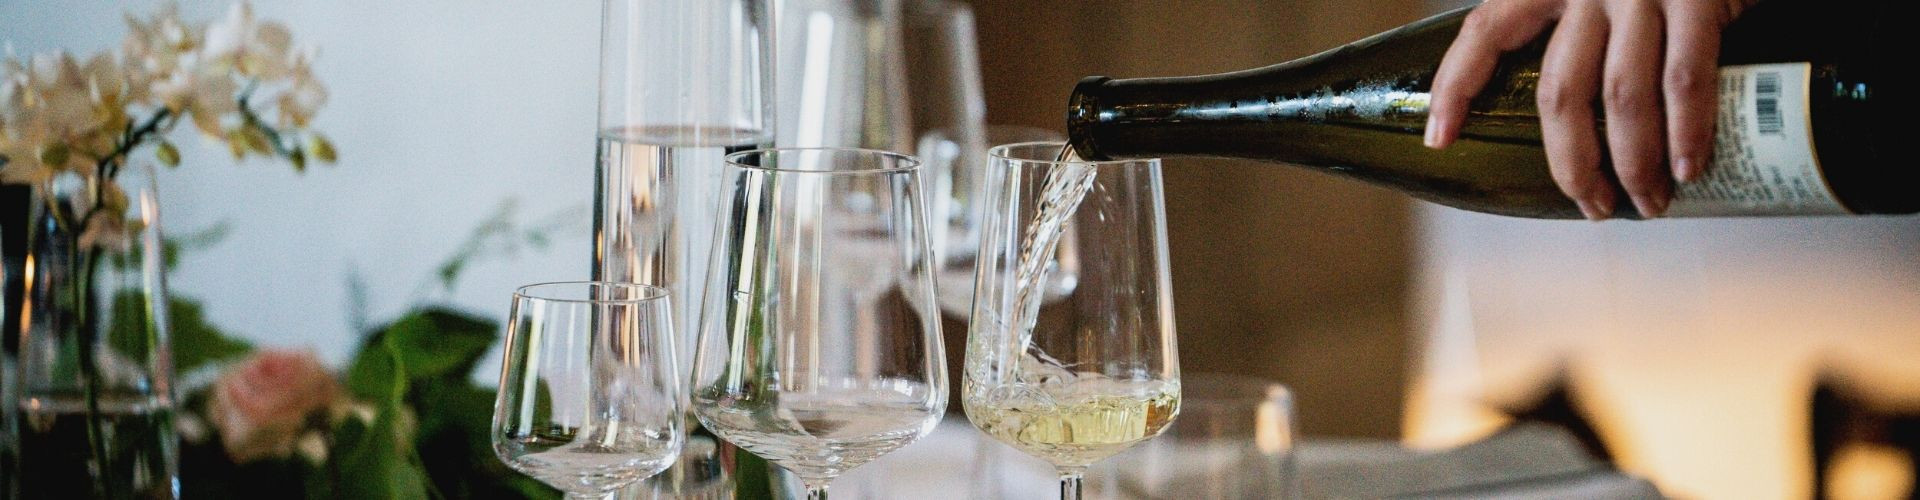 Wino Kellerei Auer